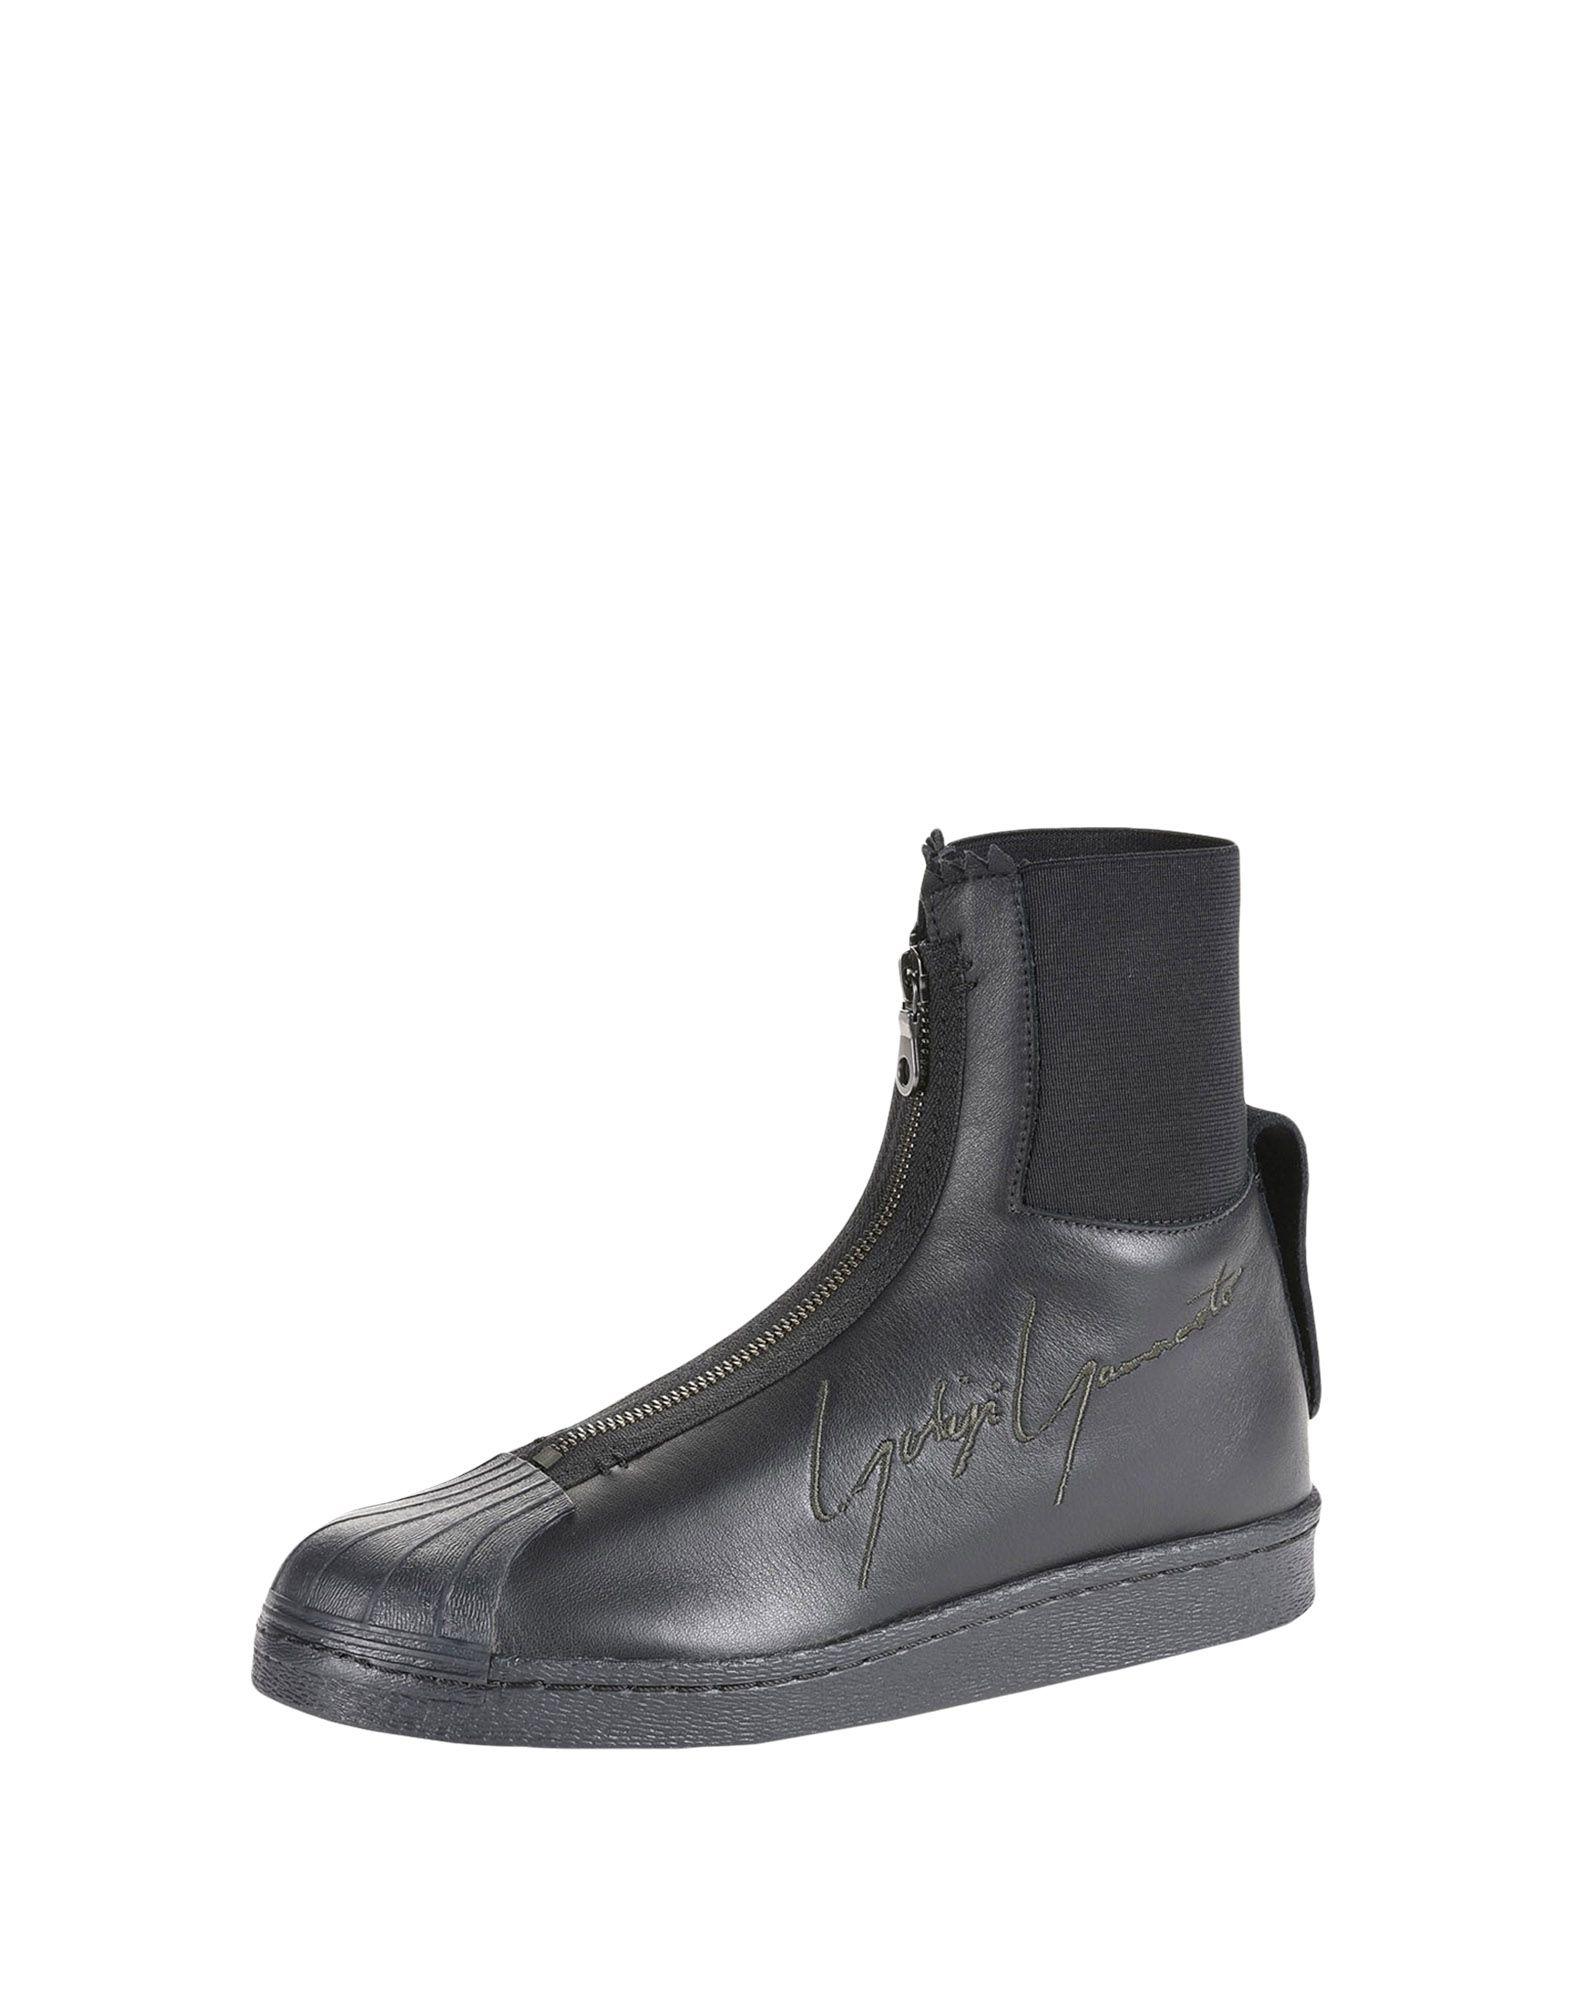 323ba0cee Adidas By Yohji Yamamoto Sneakers - Women Adidas By Yohji Yamamoto ...